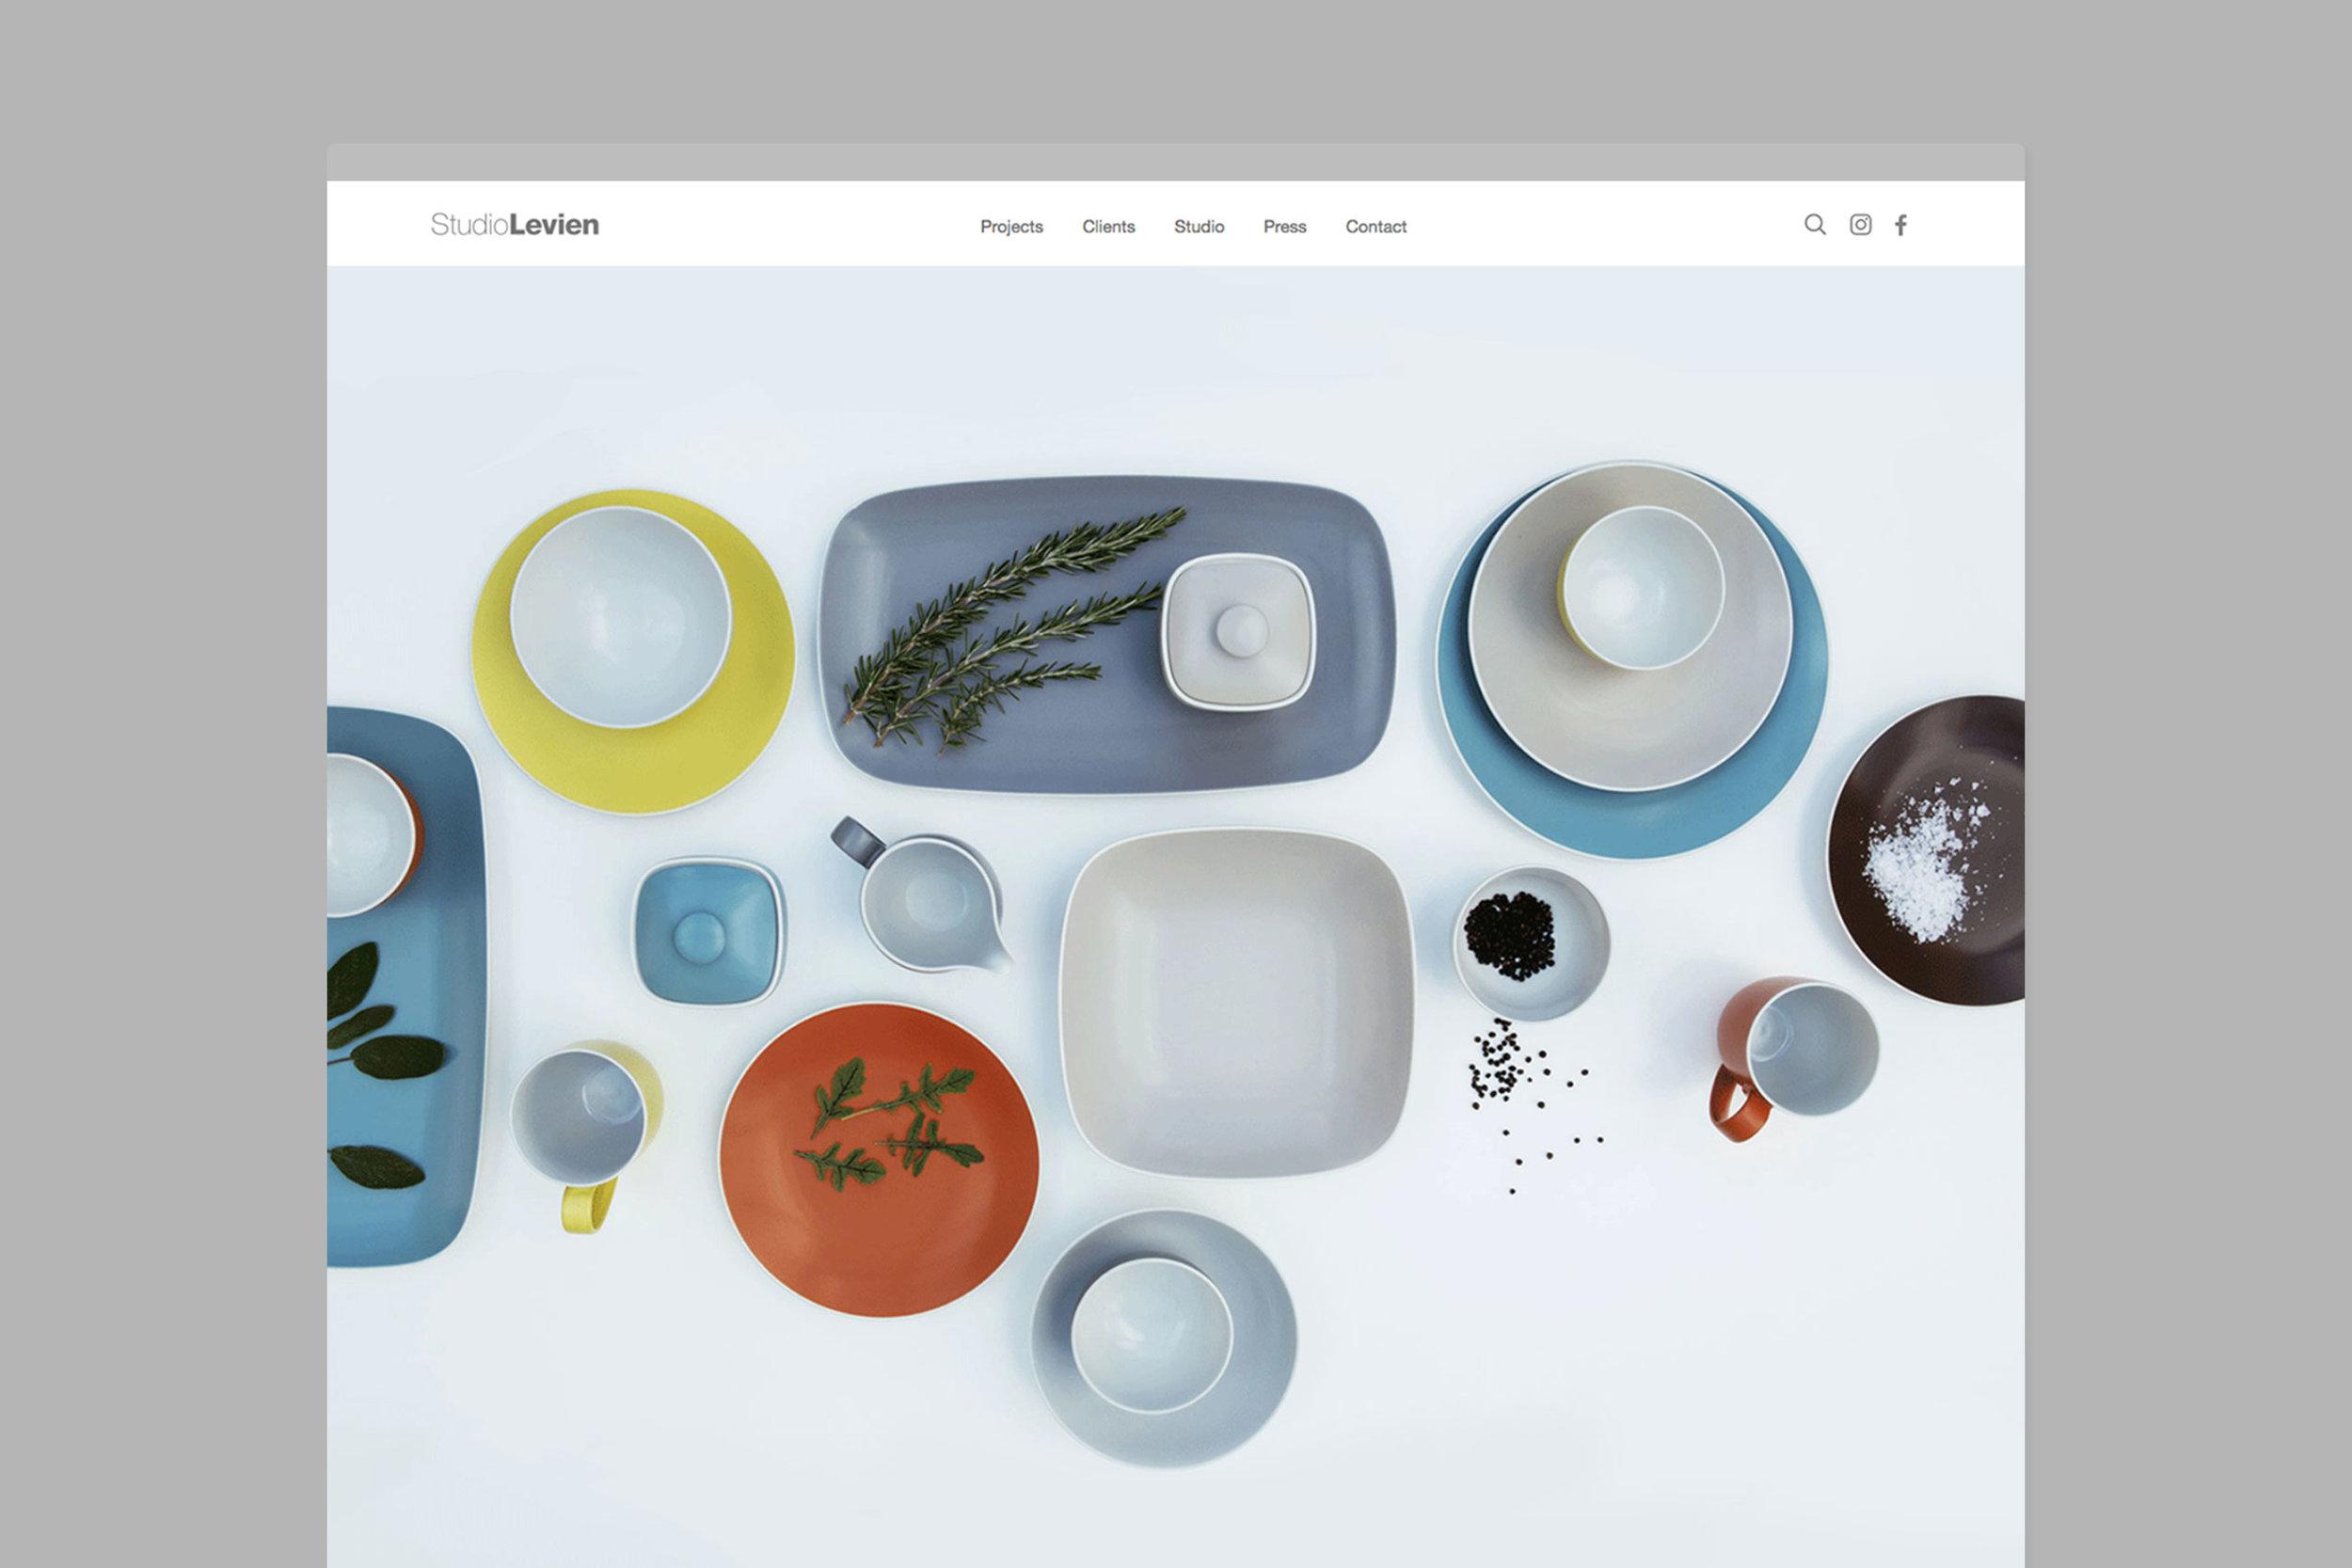 Simple professional web design for Studio Levien